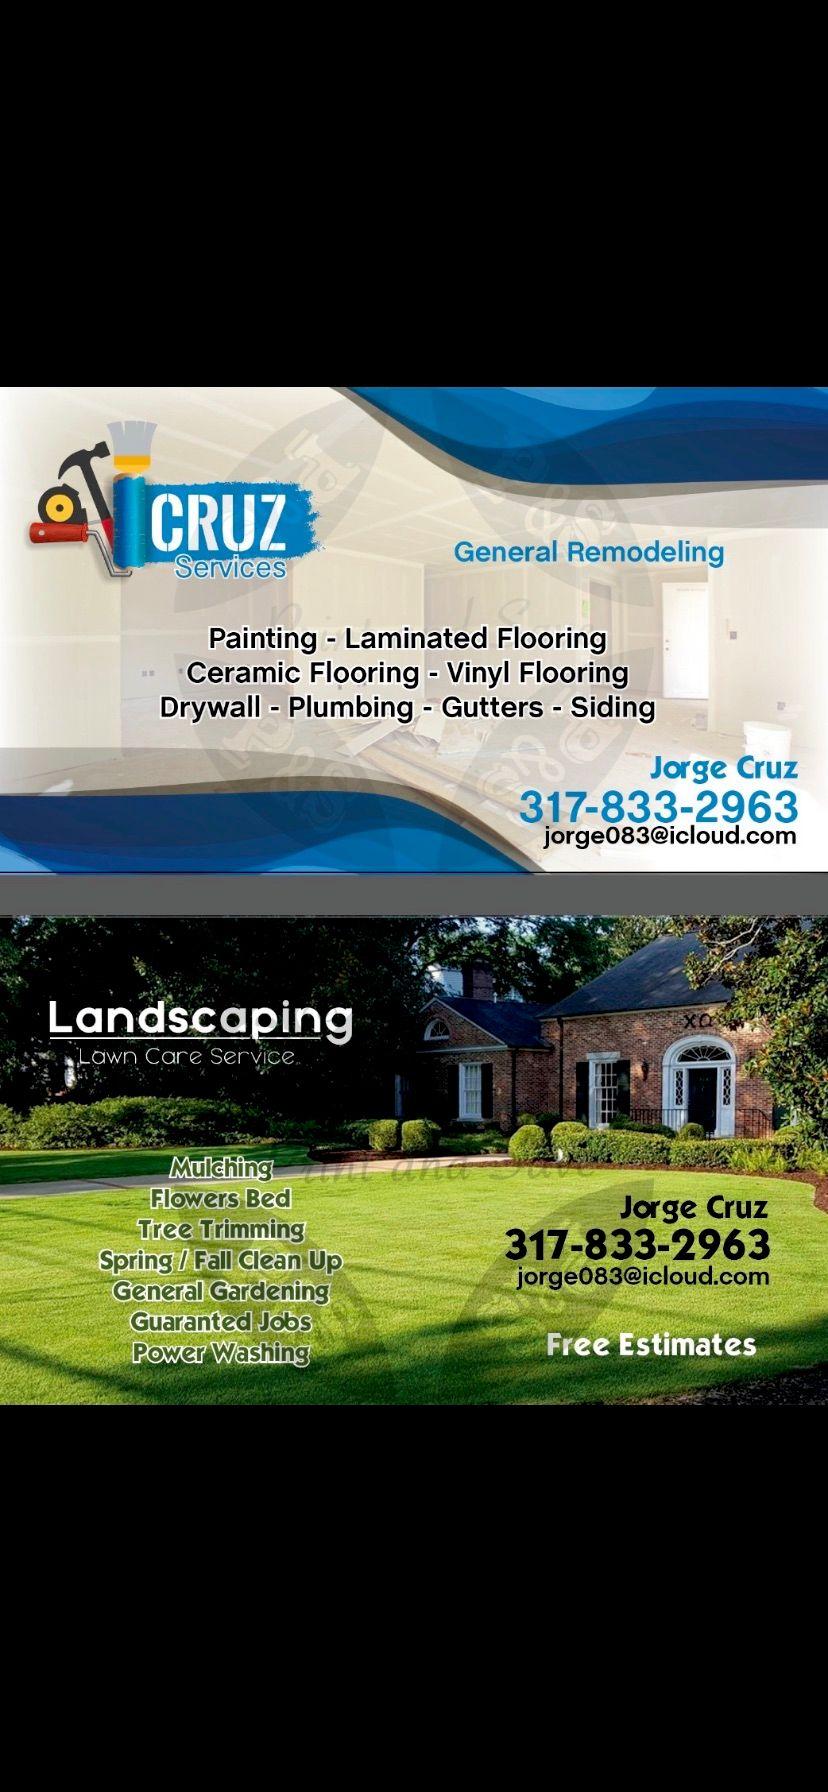 Cruz services